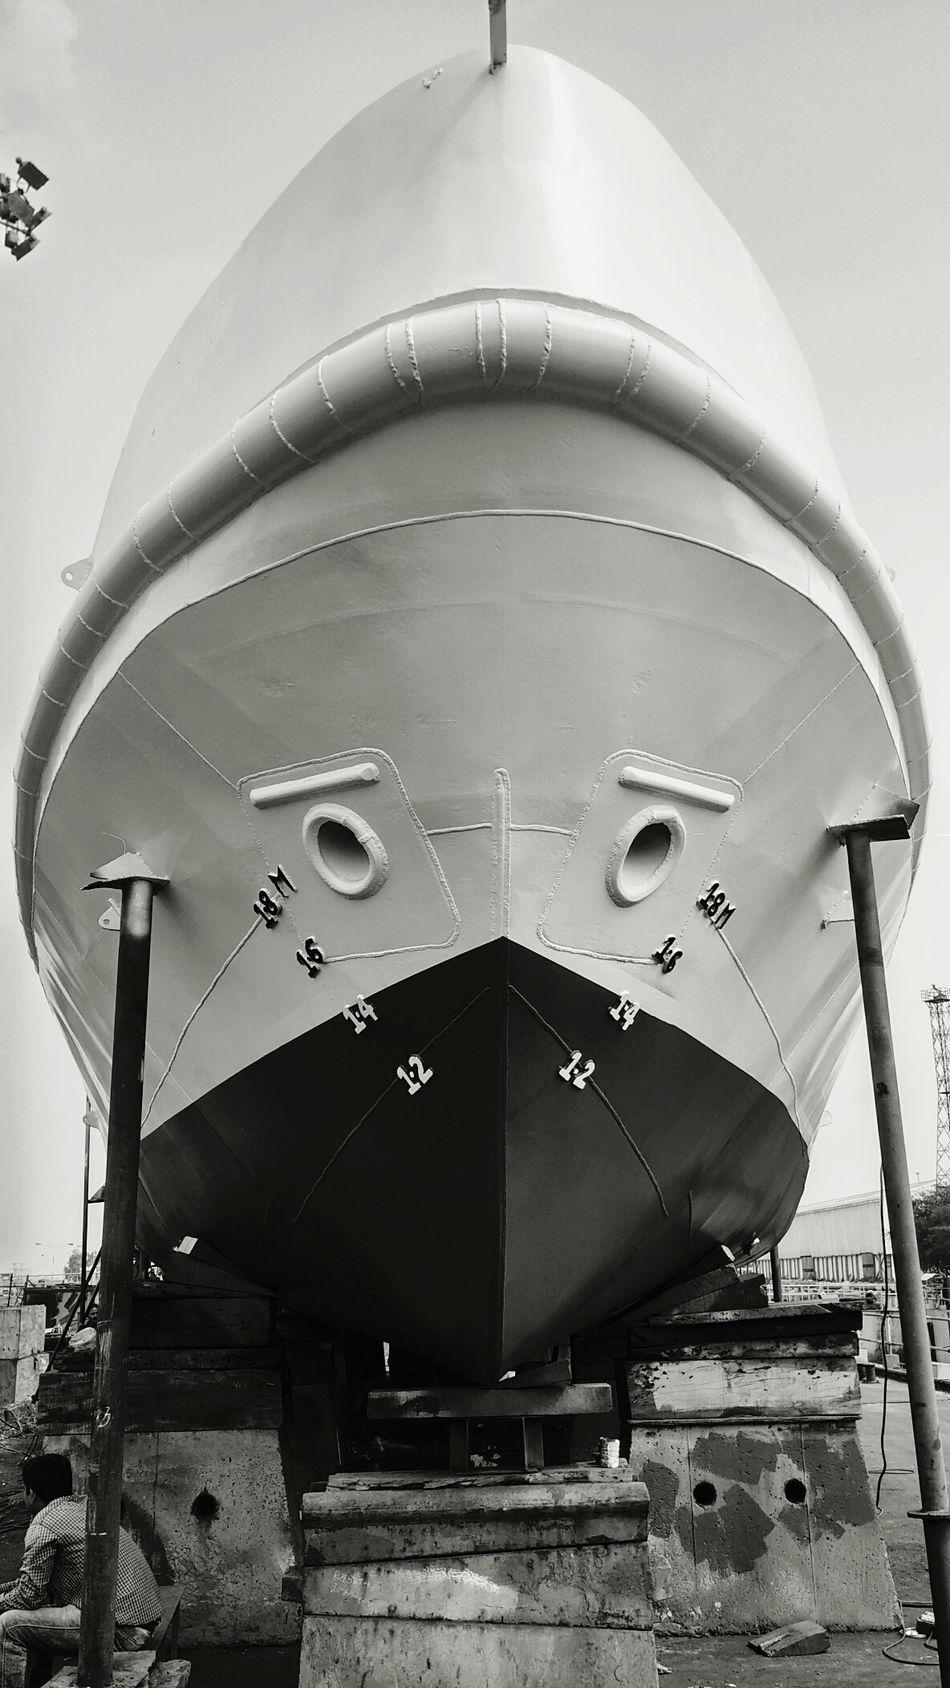 Launching soon. Survey Boat Vessel Shipbuilding Yard Ships⚓️⛵️🚢 Paradip